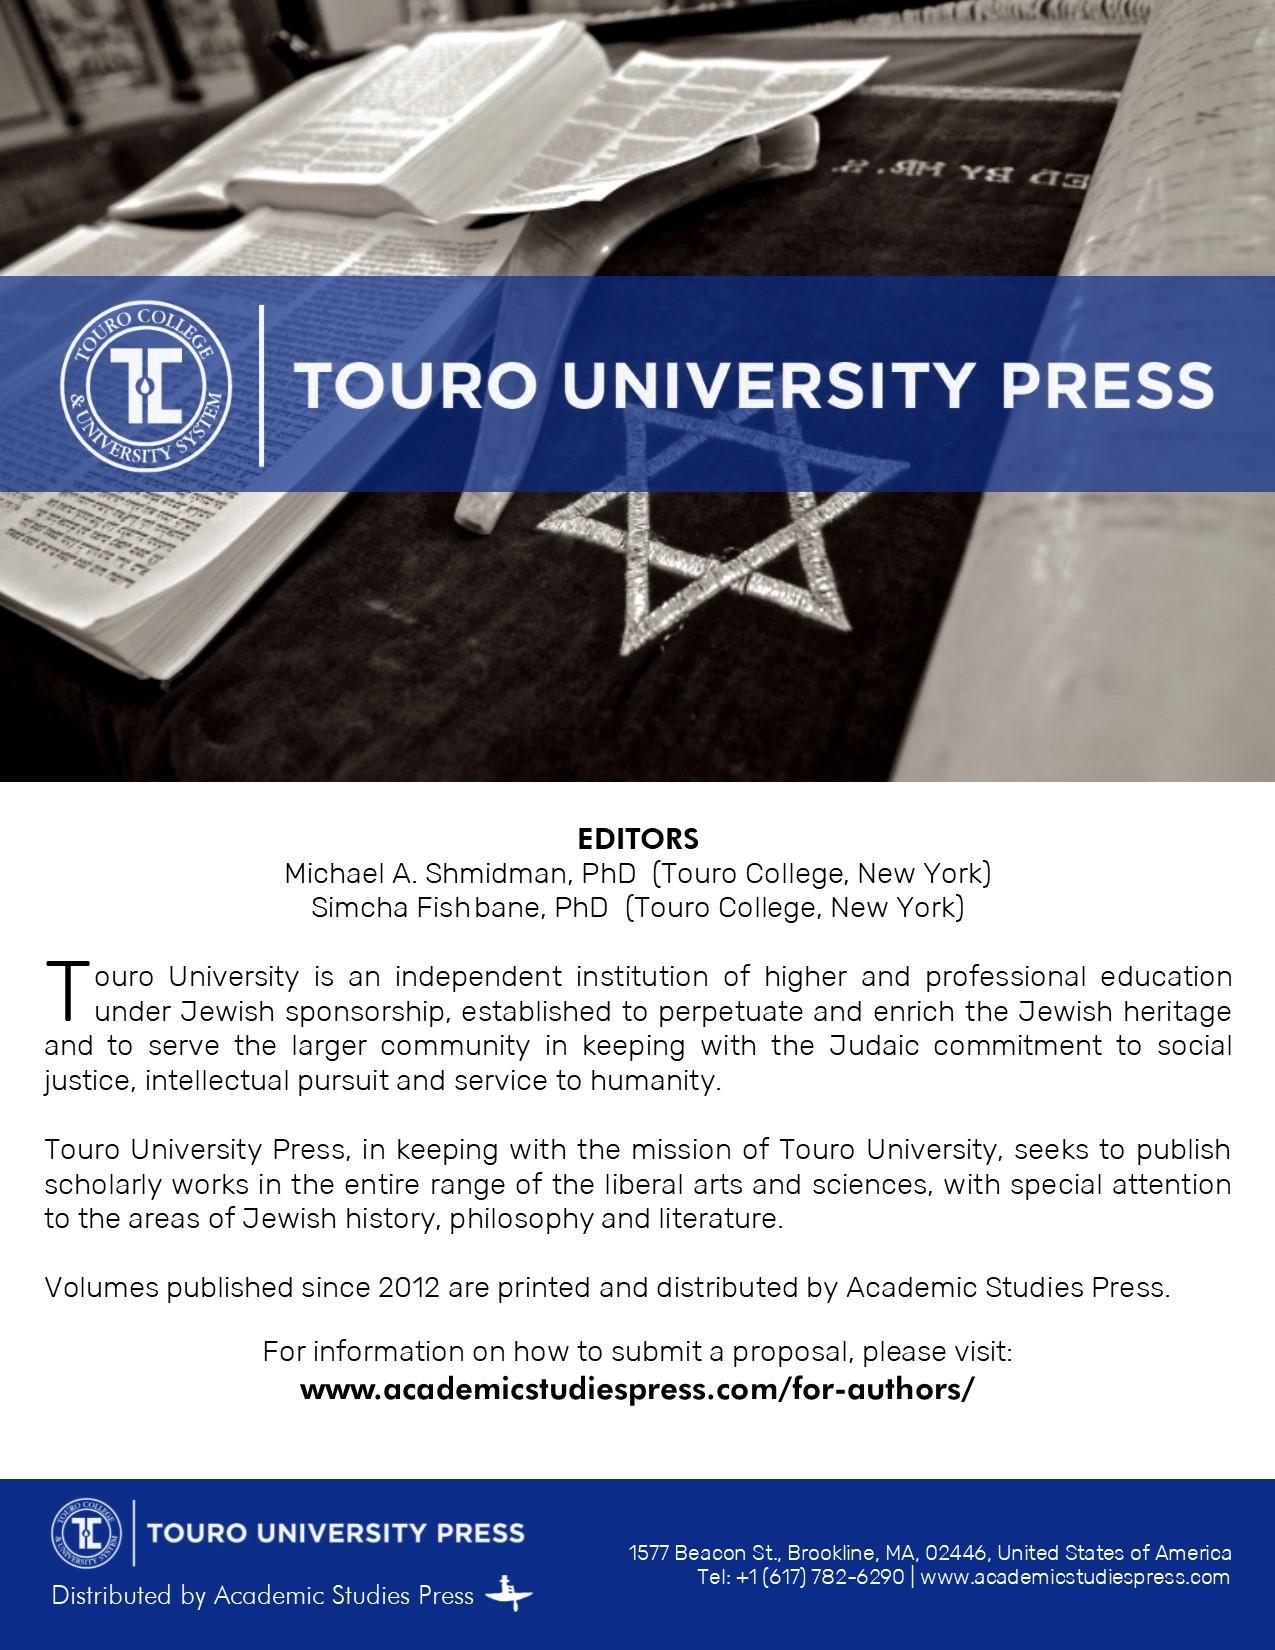 Download flyer